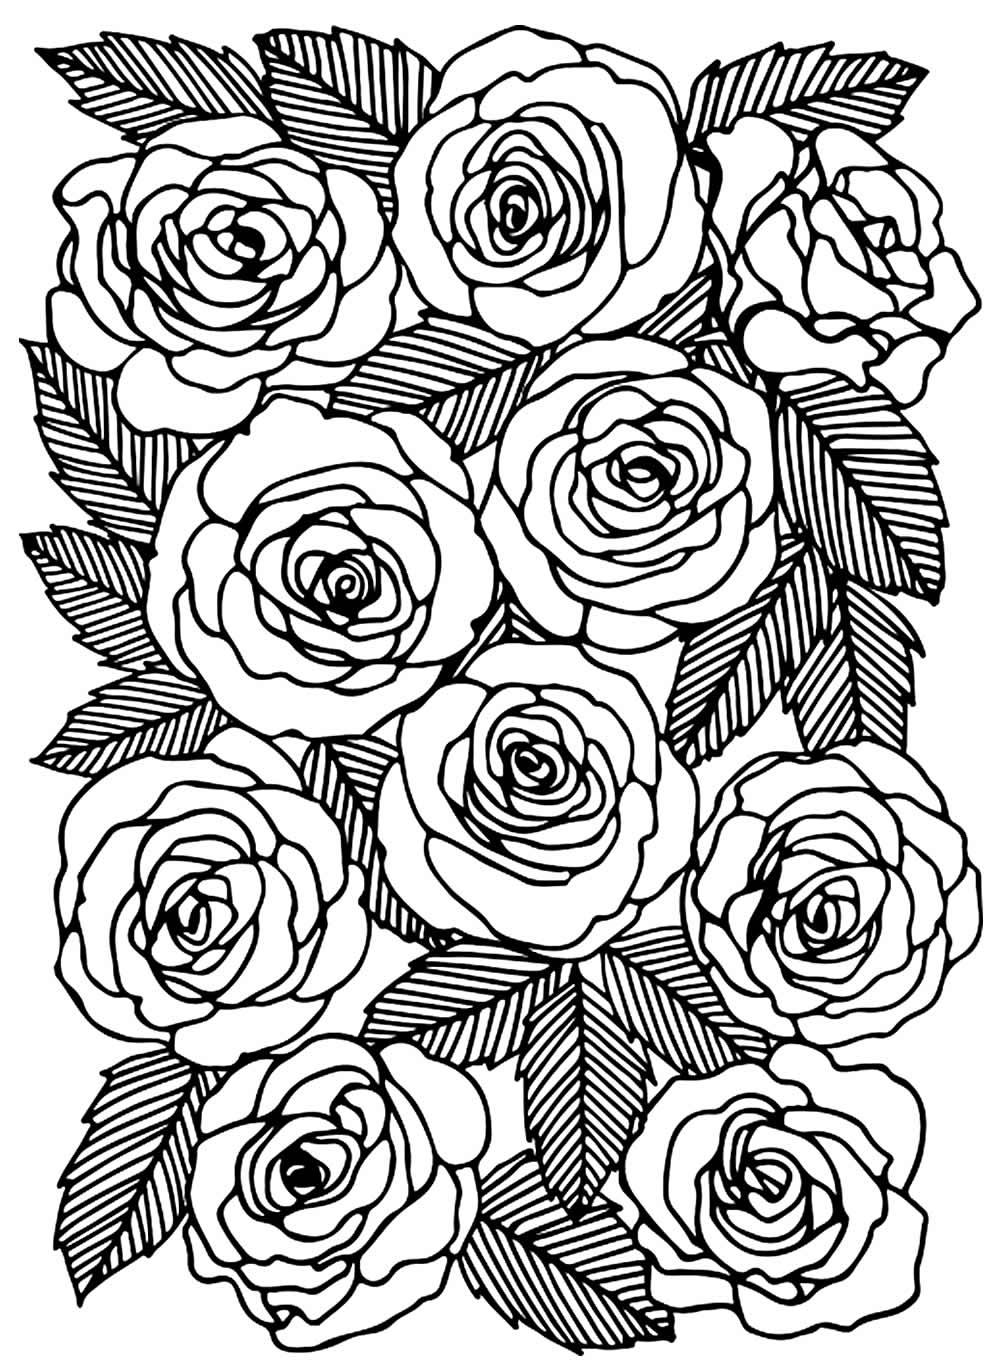 Molde de rosas para artesanato